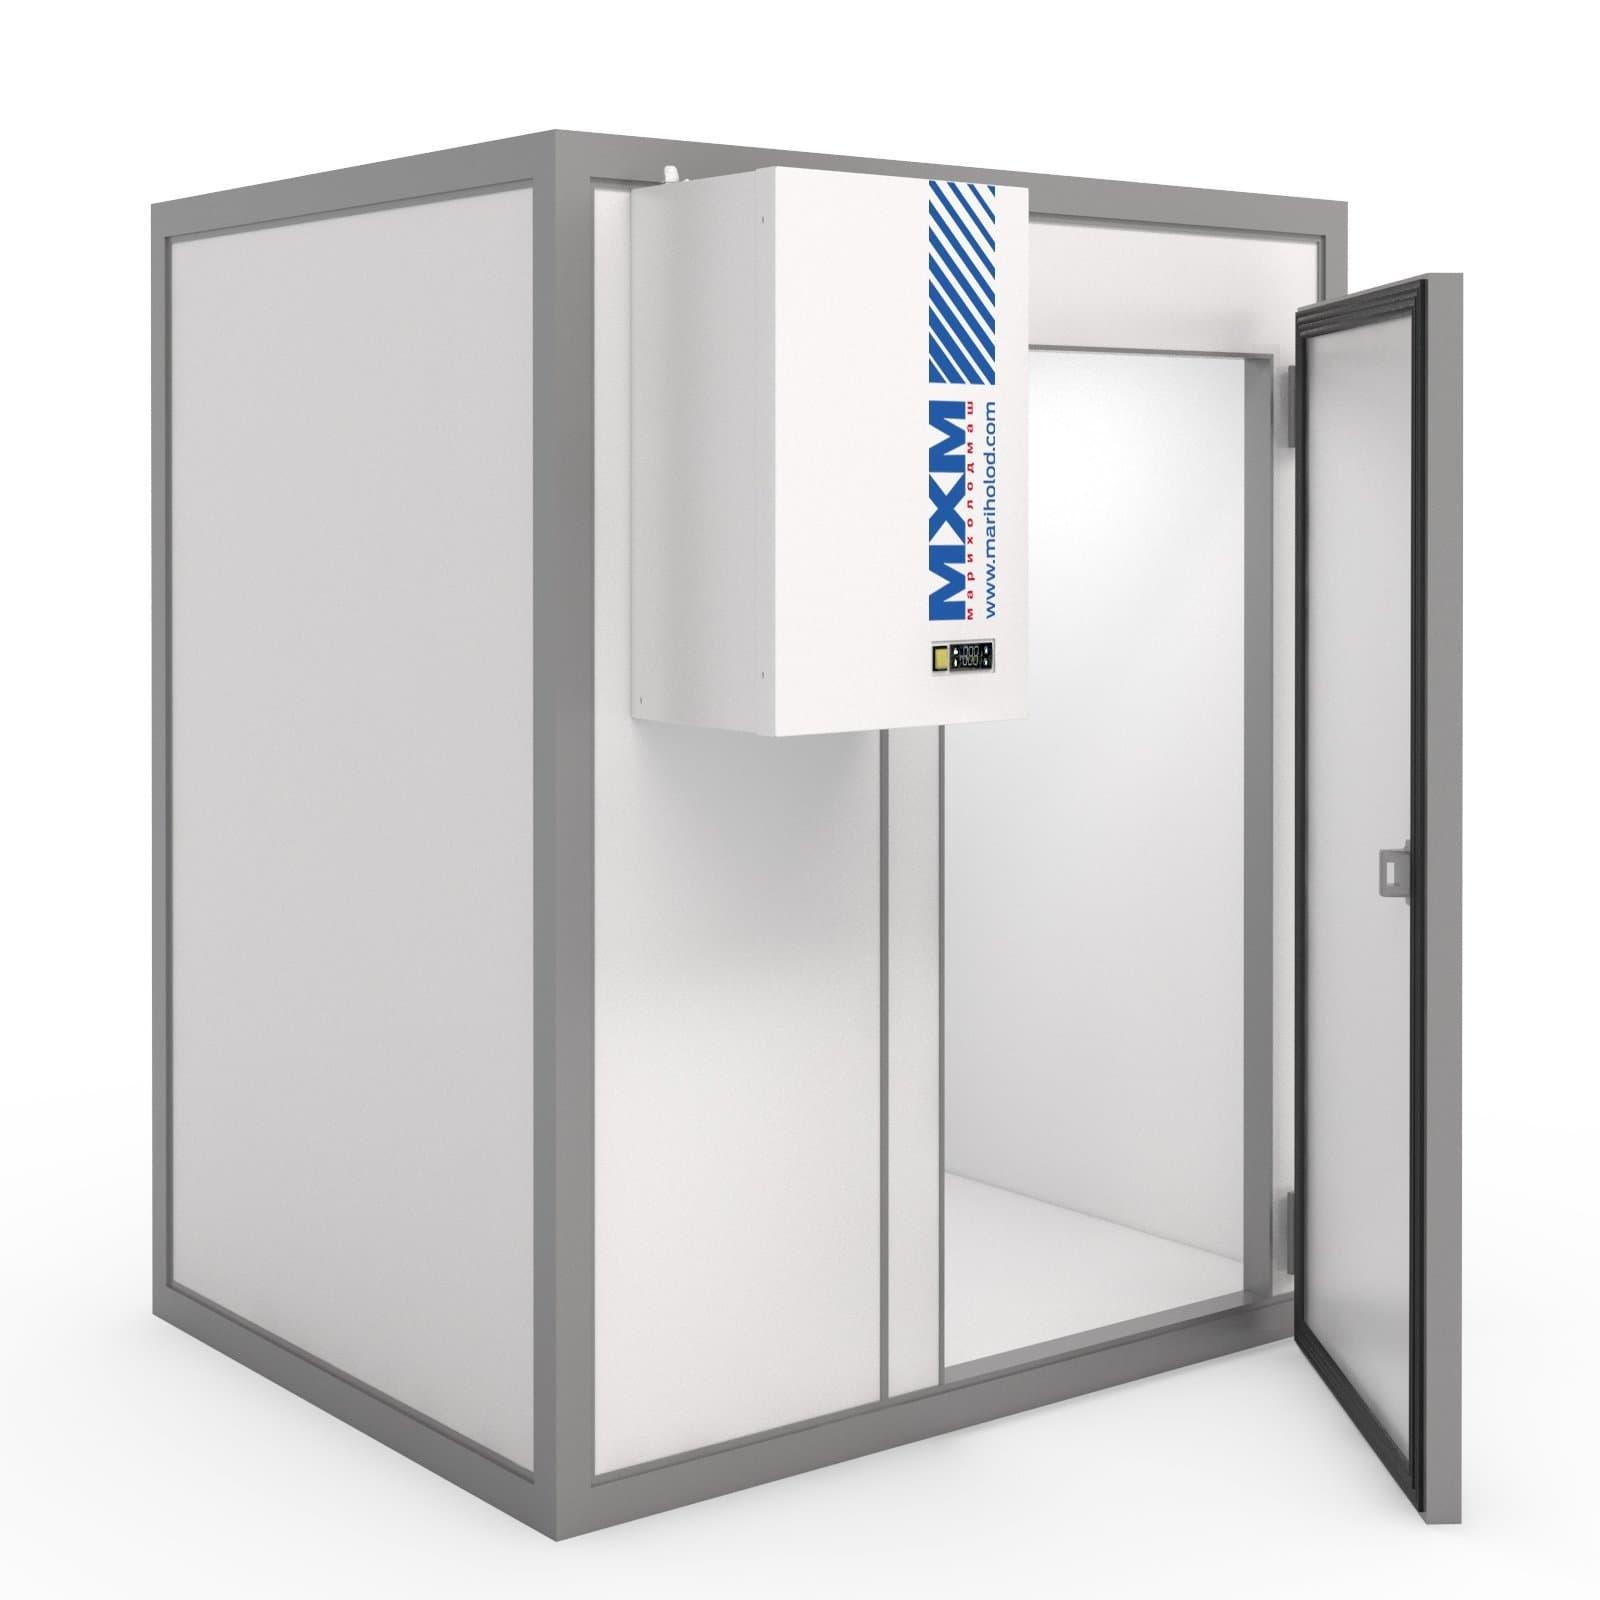 Камера холодильная МХМ КХН-44,71 2560×8260×2460